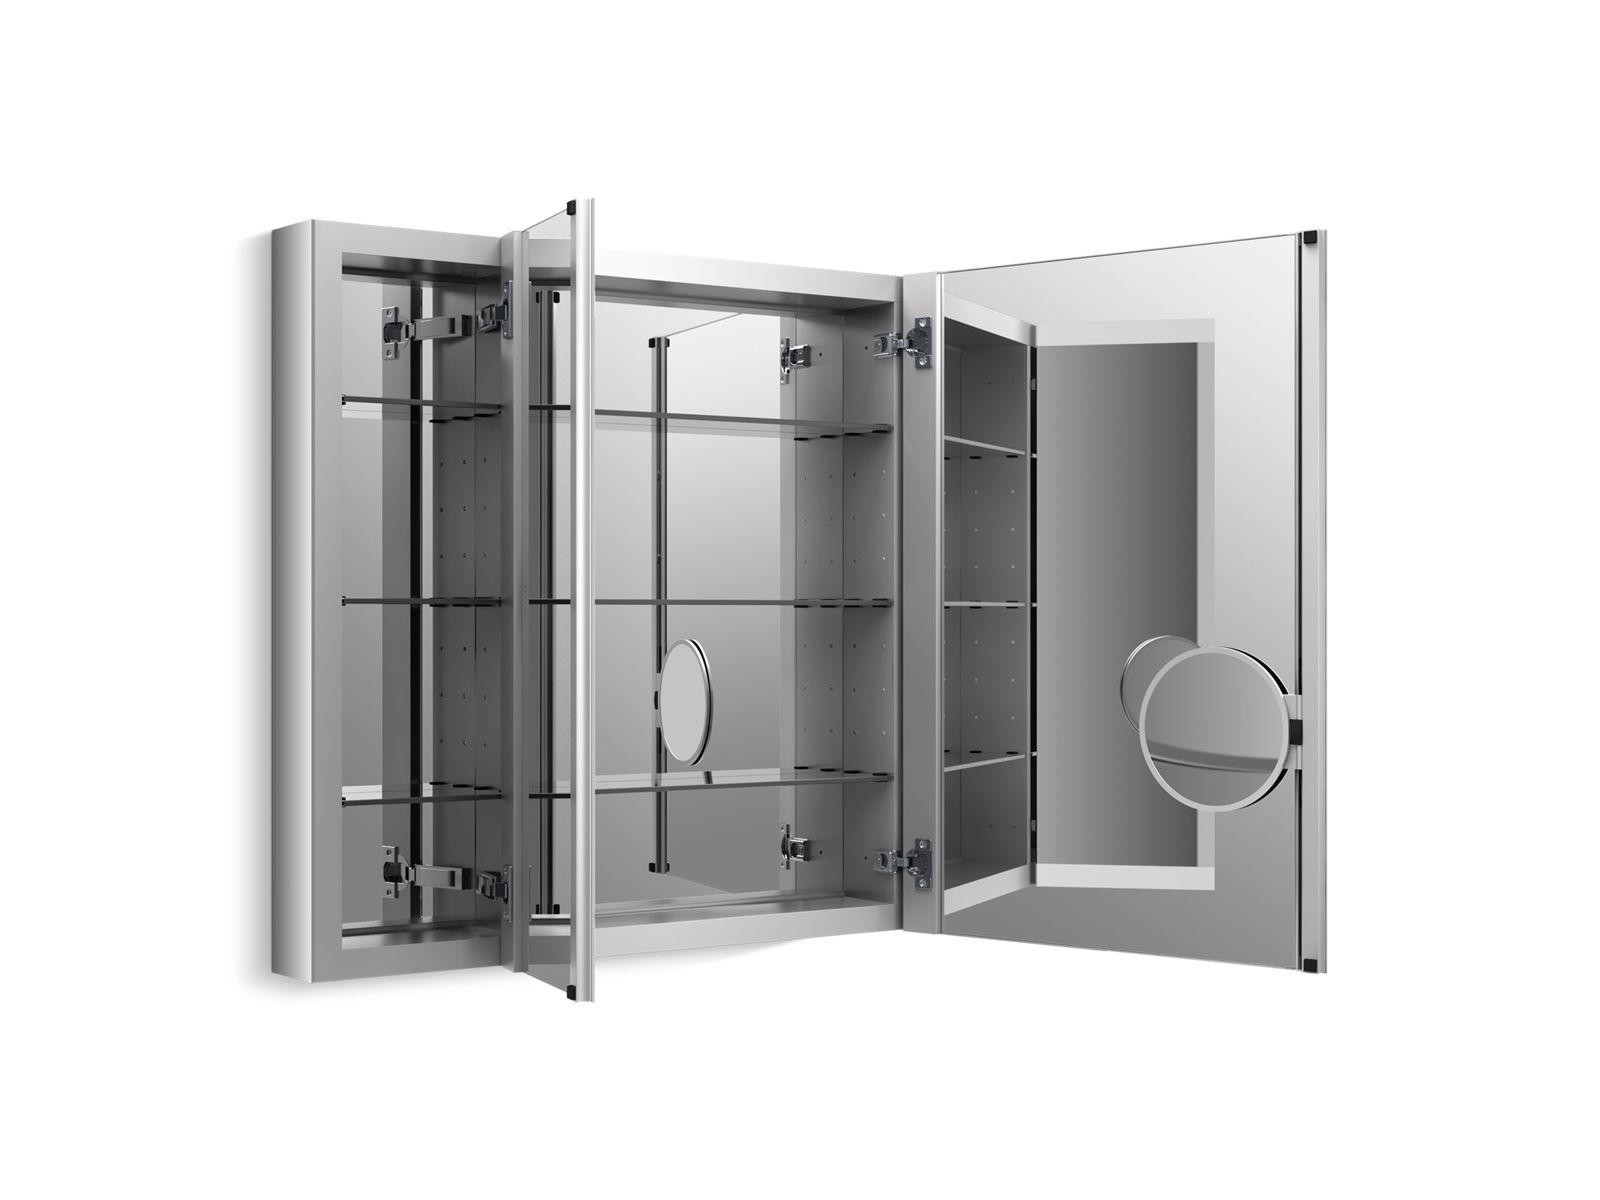 K 99011 | Verdera Medicine Cabinet With Triple Mirrored Doors | KOHLER